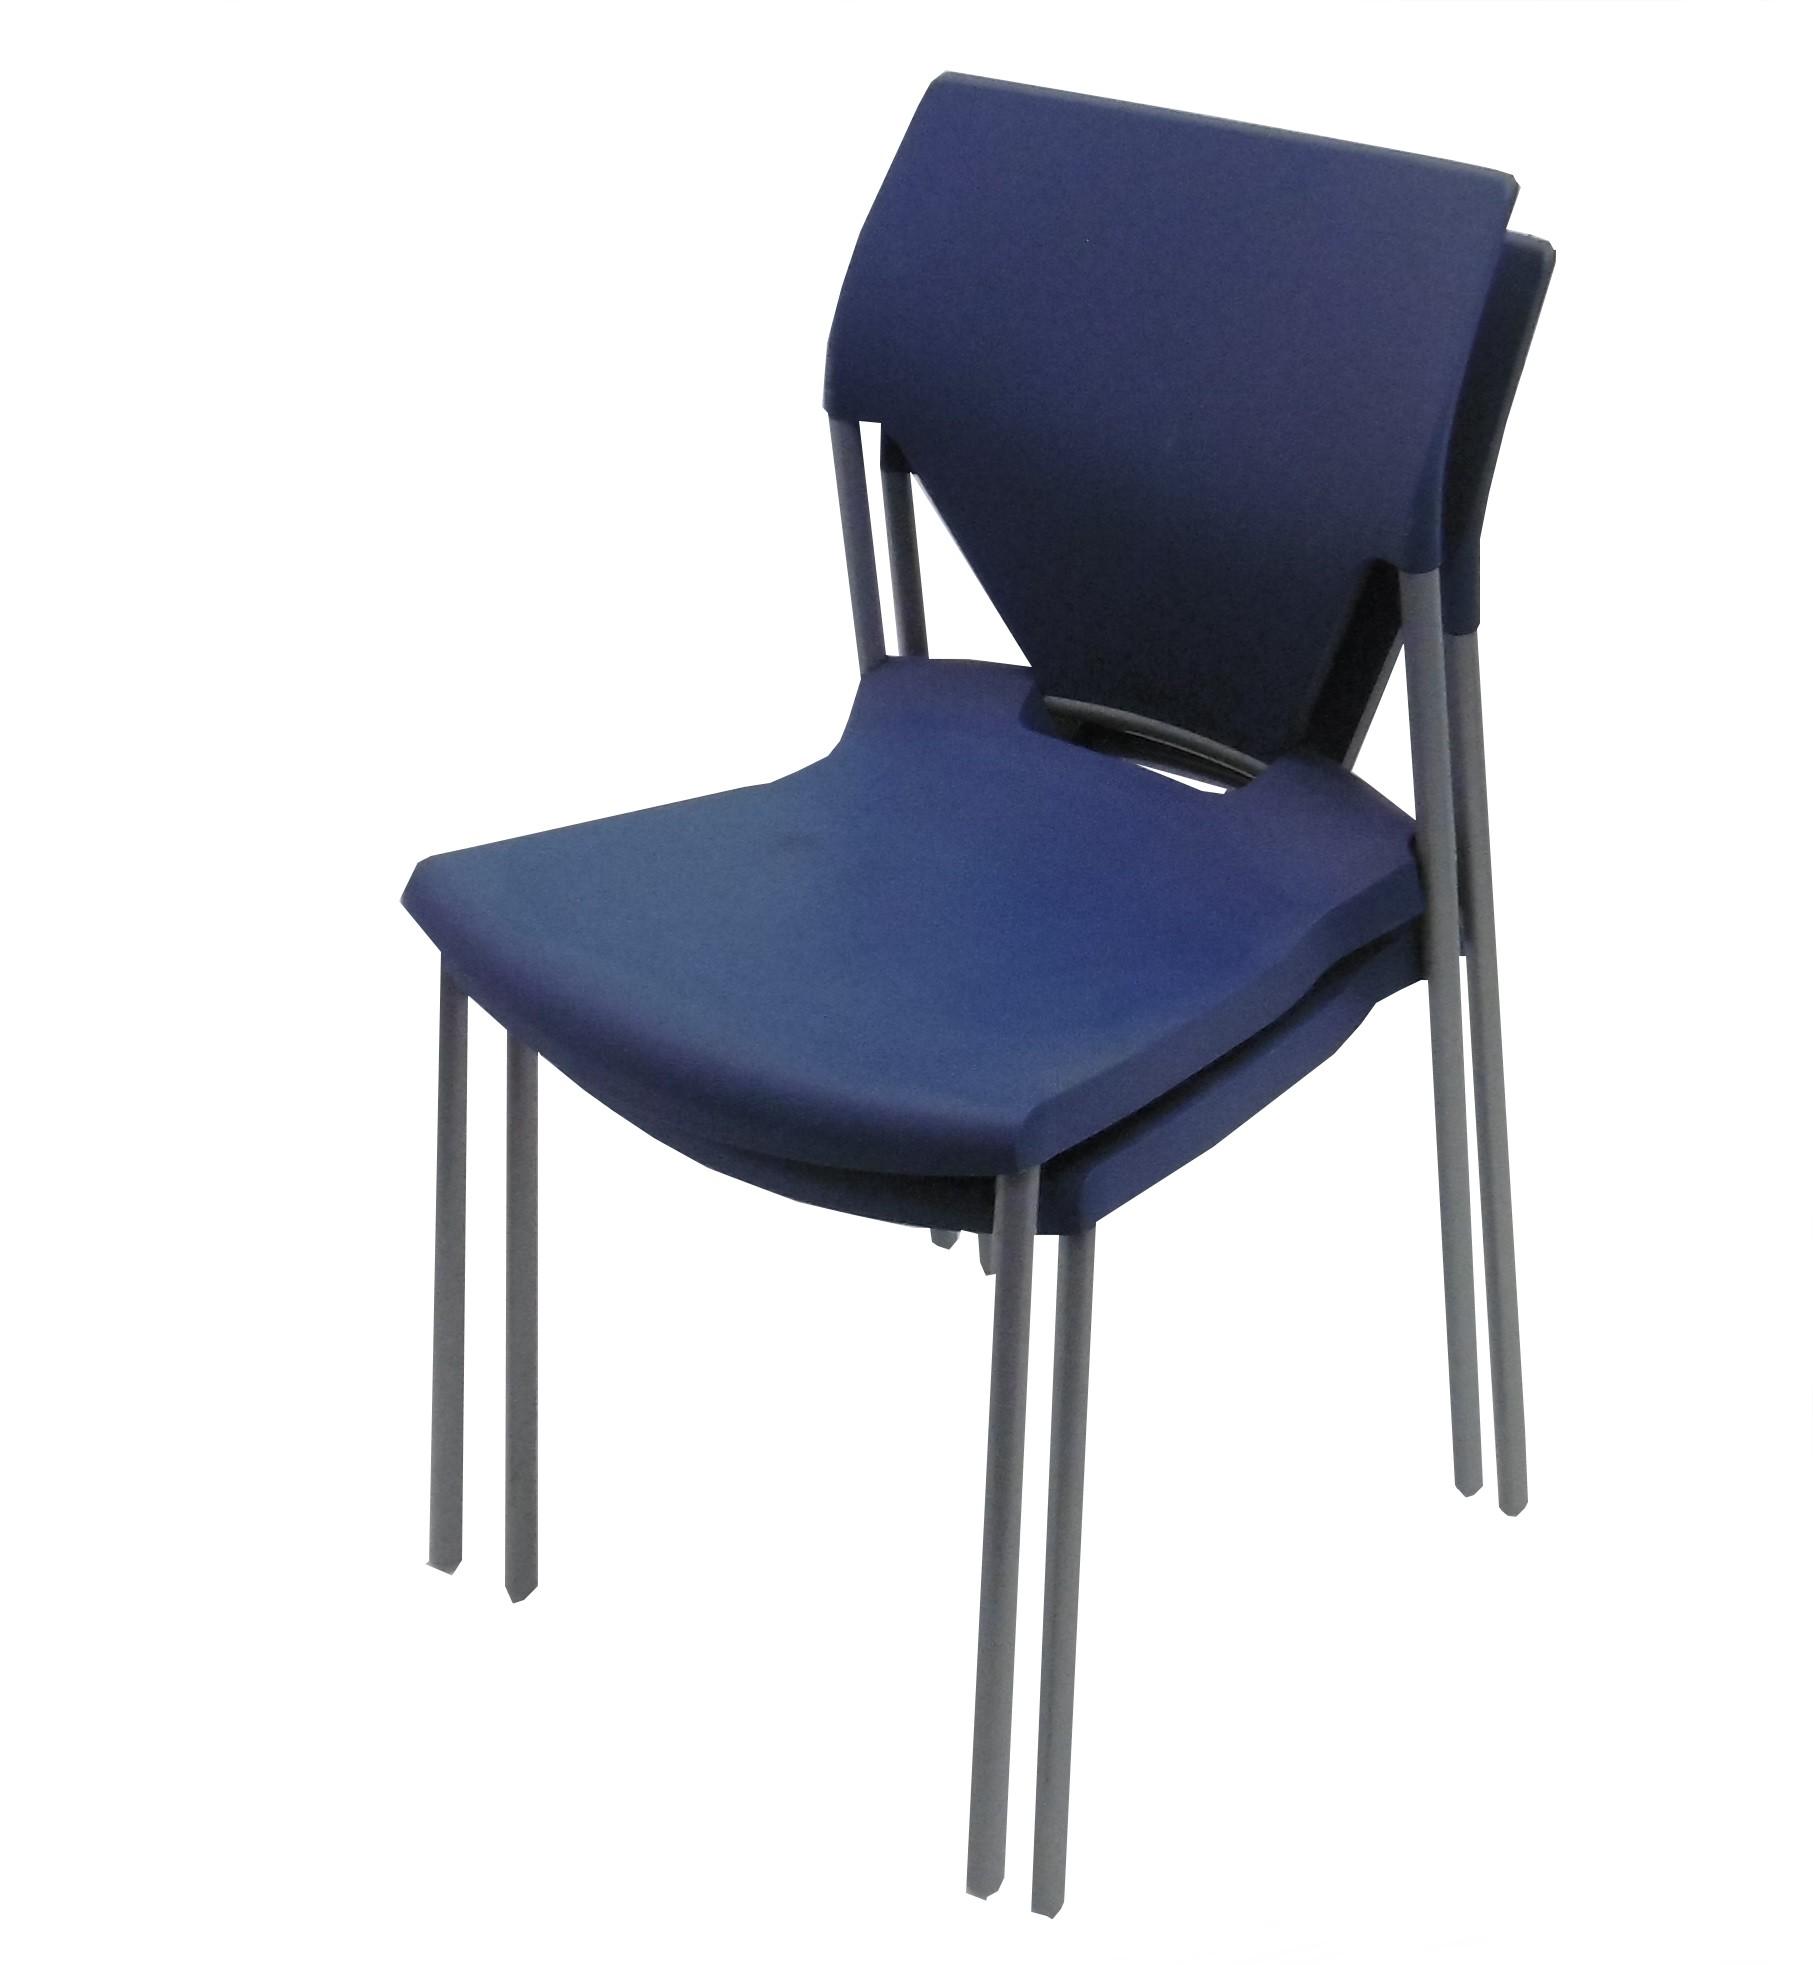 chaise pas cher mobilier salle d